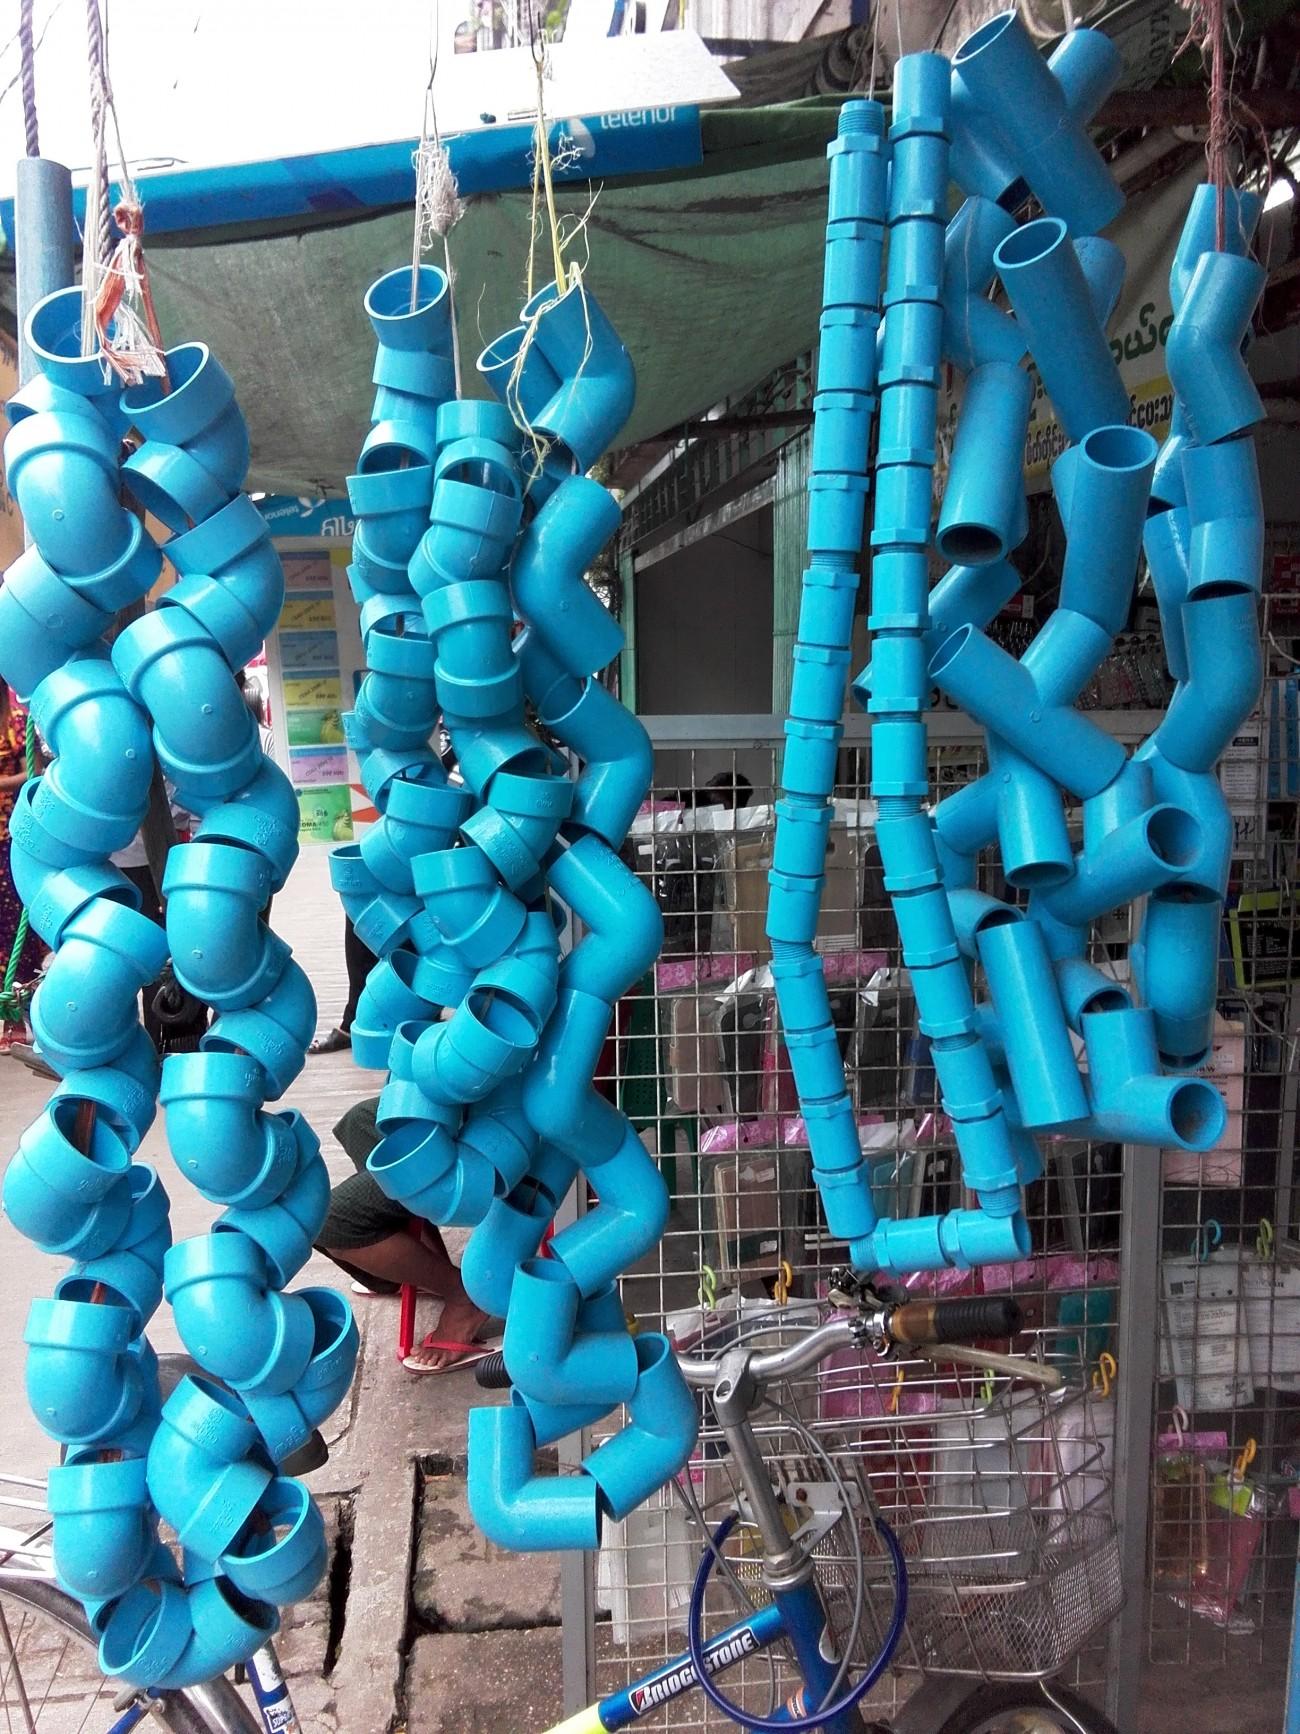 Steve Giasson. Performance invisible n° 2 (S'efforcer de réaliser un concert Fluxus en rêve.) Performeur : Nyein Way. ''a midqife colour''. Rangoun, Birmanie. 12 août 2015.